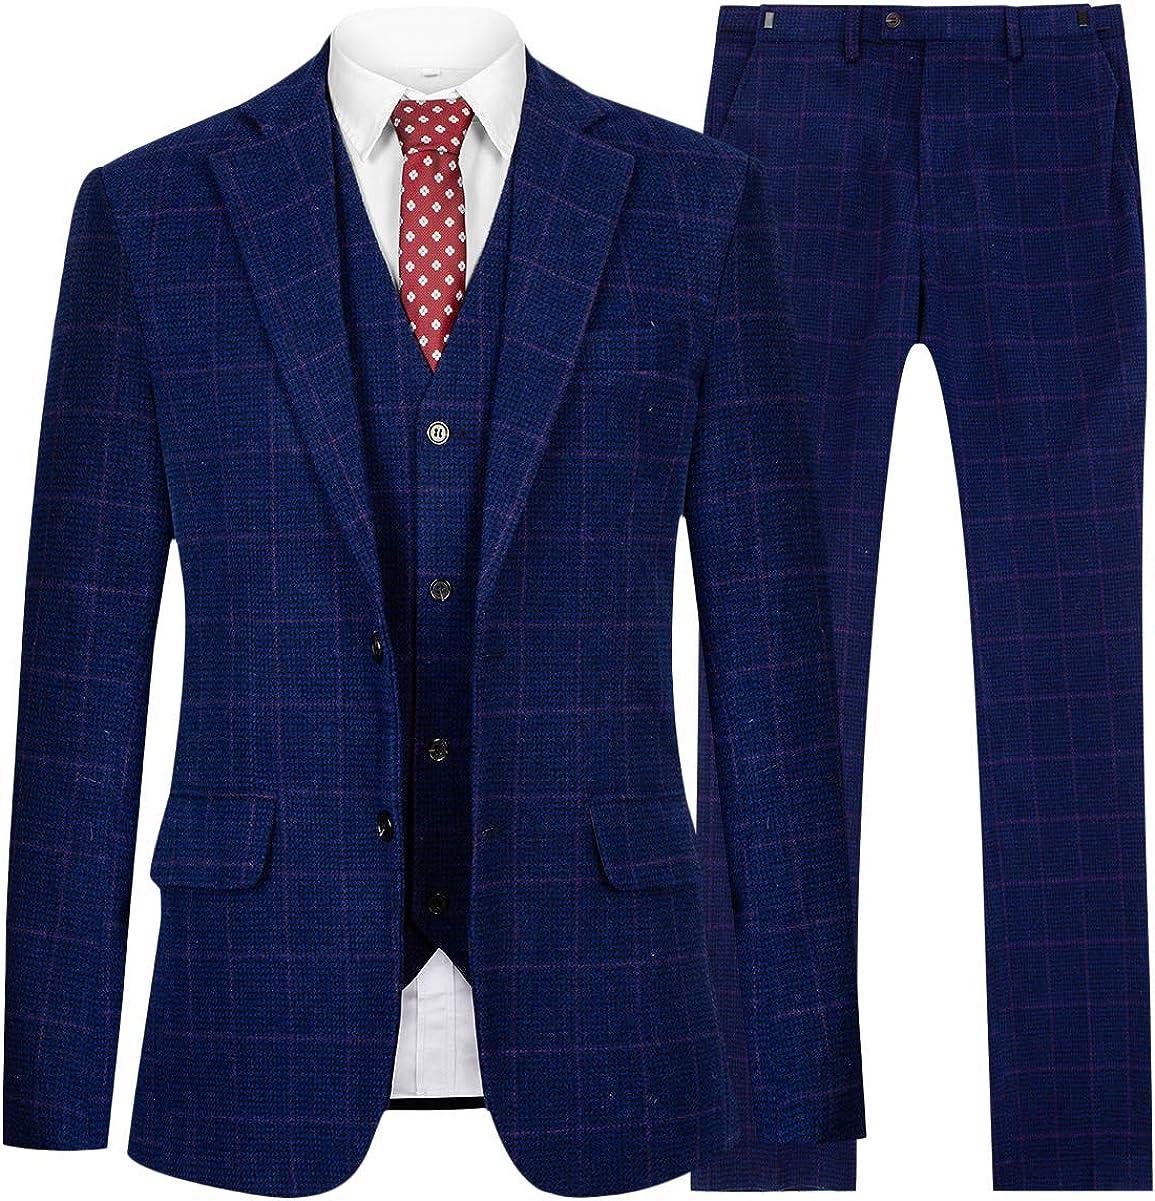 CMDC Mens 3 Pieces Suit Double Button Tweed Wool Slim Fit Party Blazer